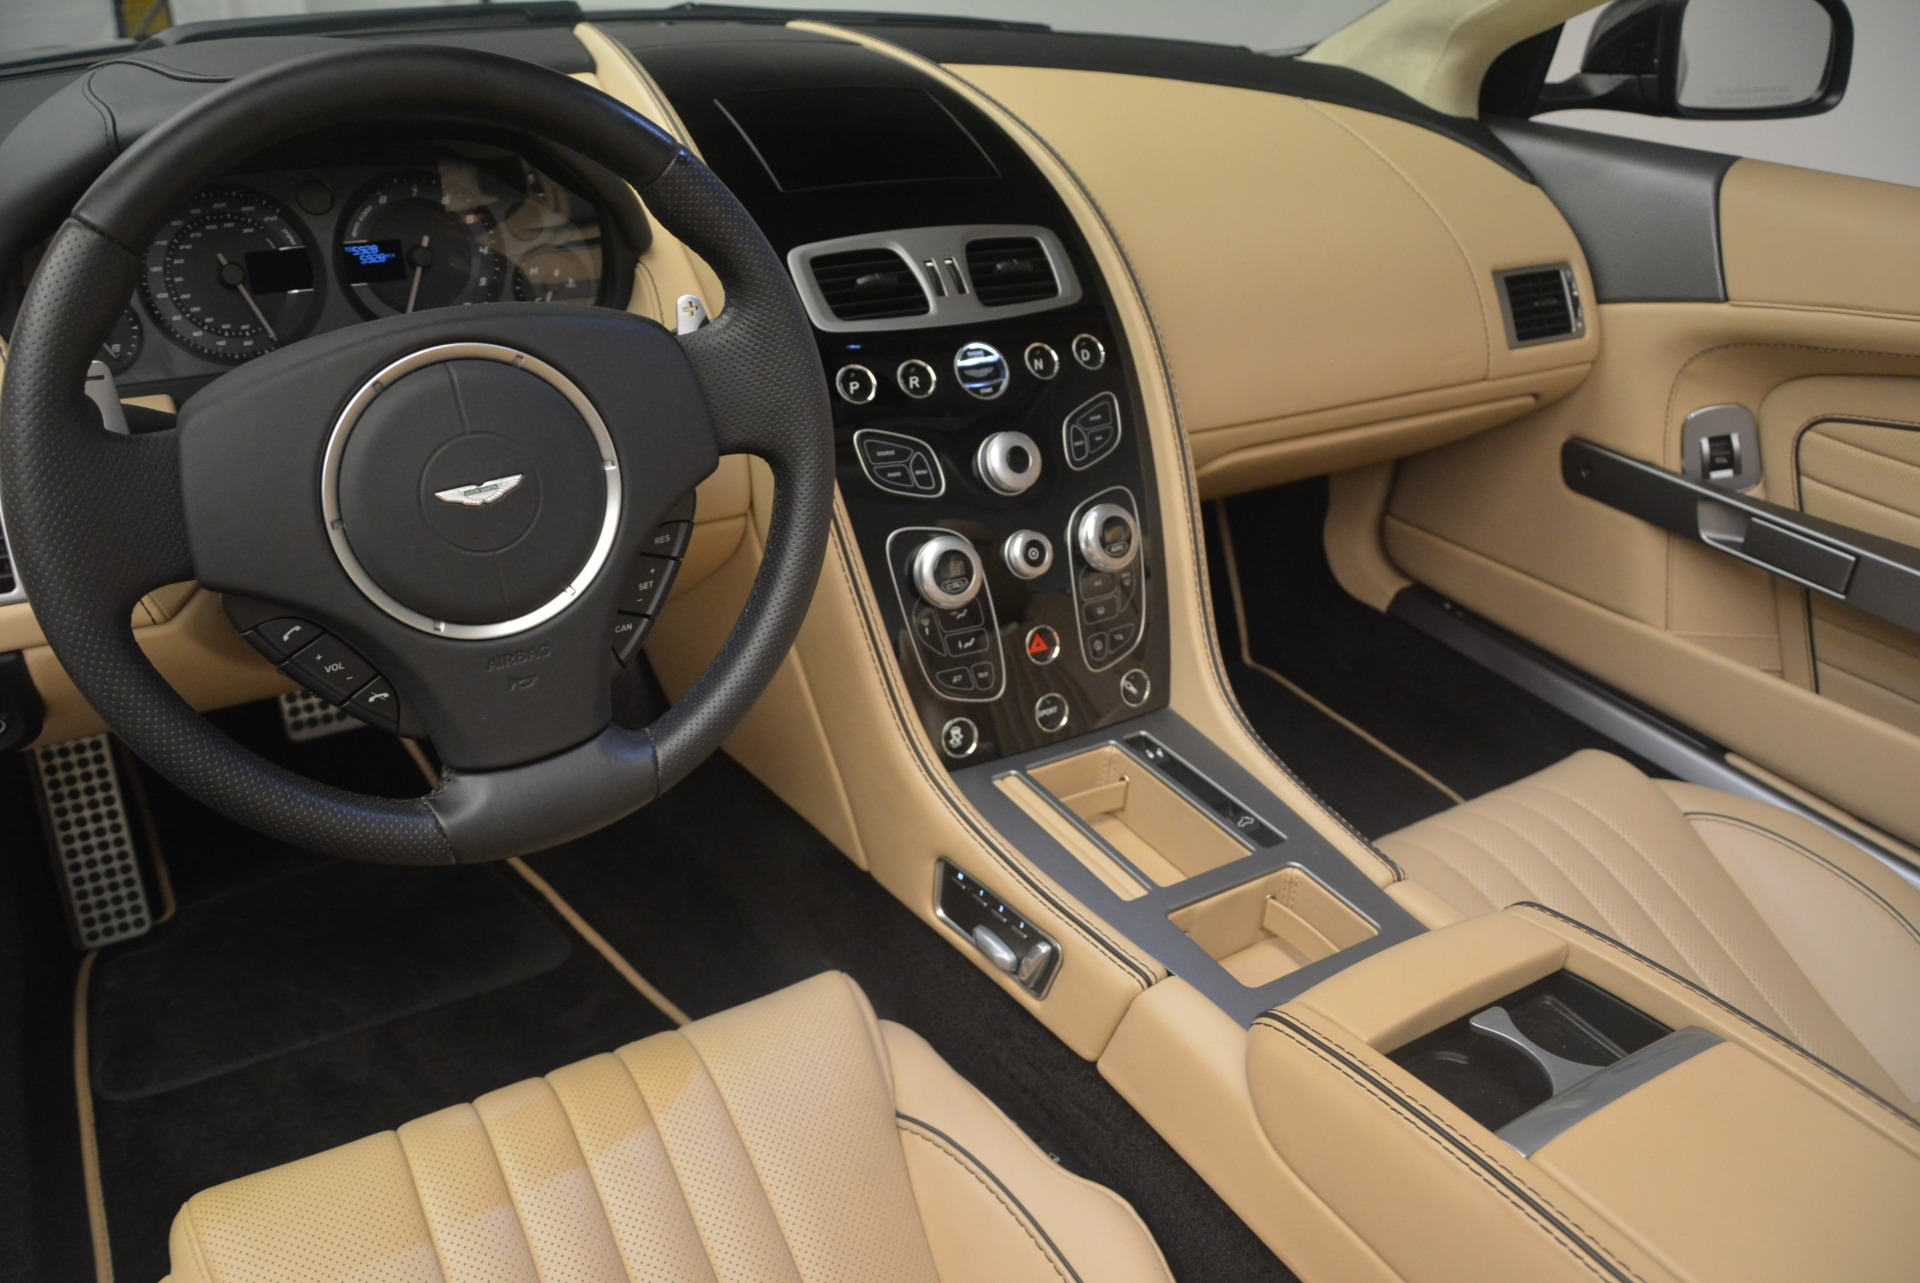 Used 2016 Aston Martin DB9 GT Volante For Sale In Greenwich, CT 2429_p25